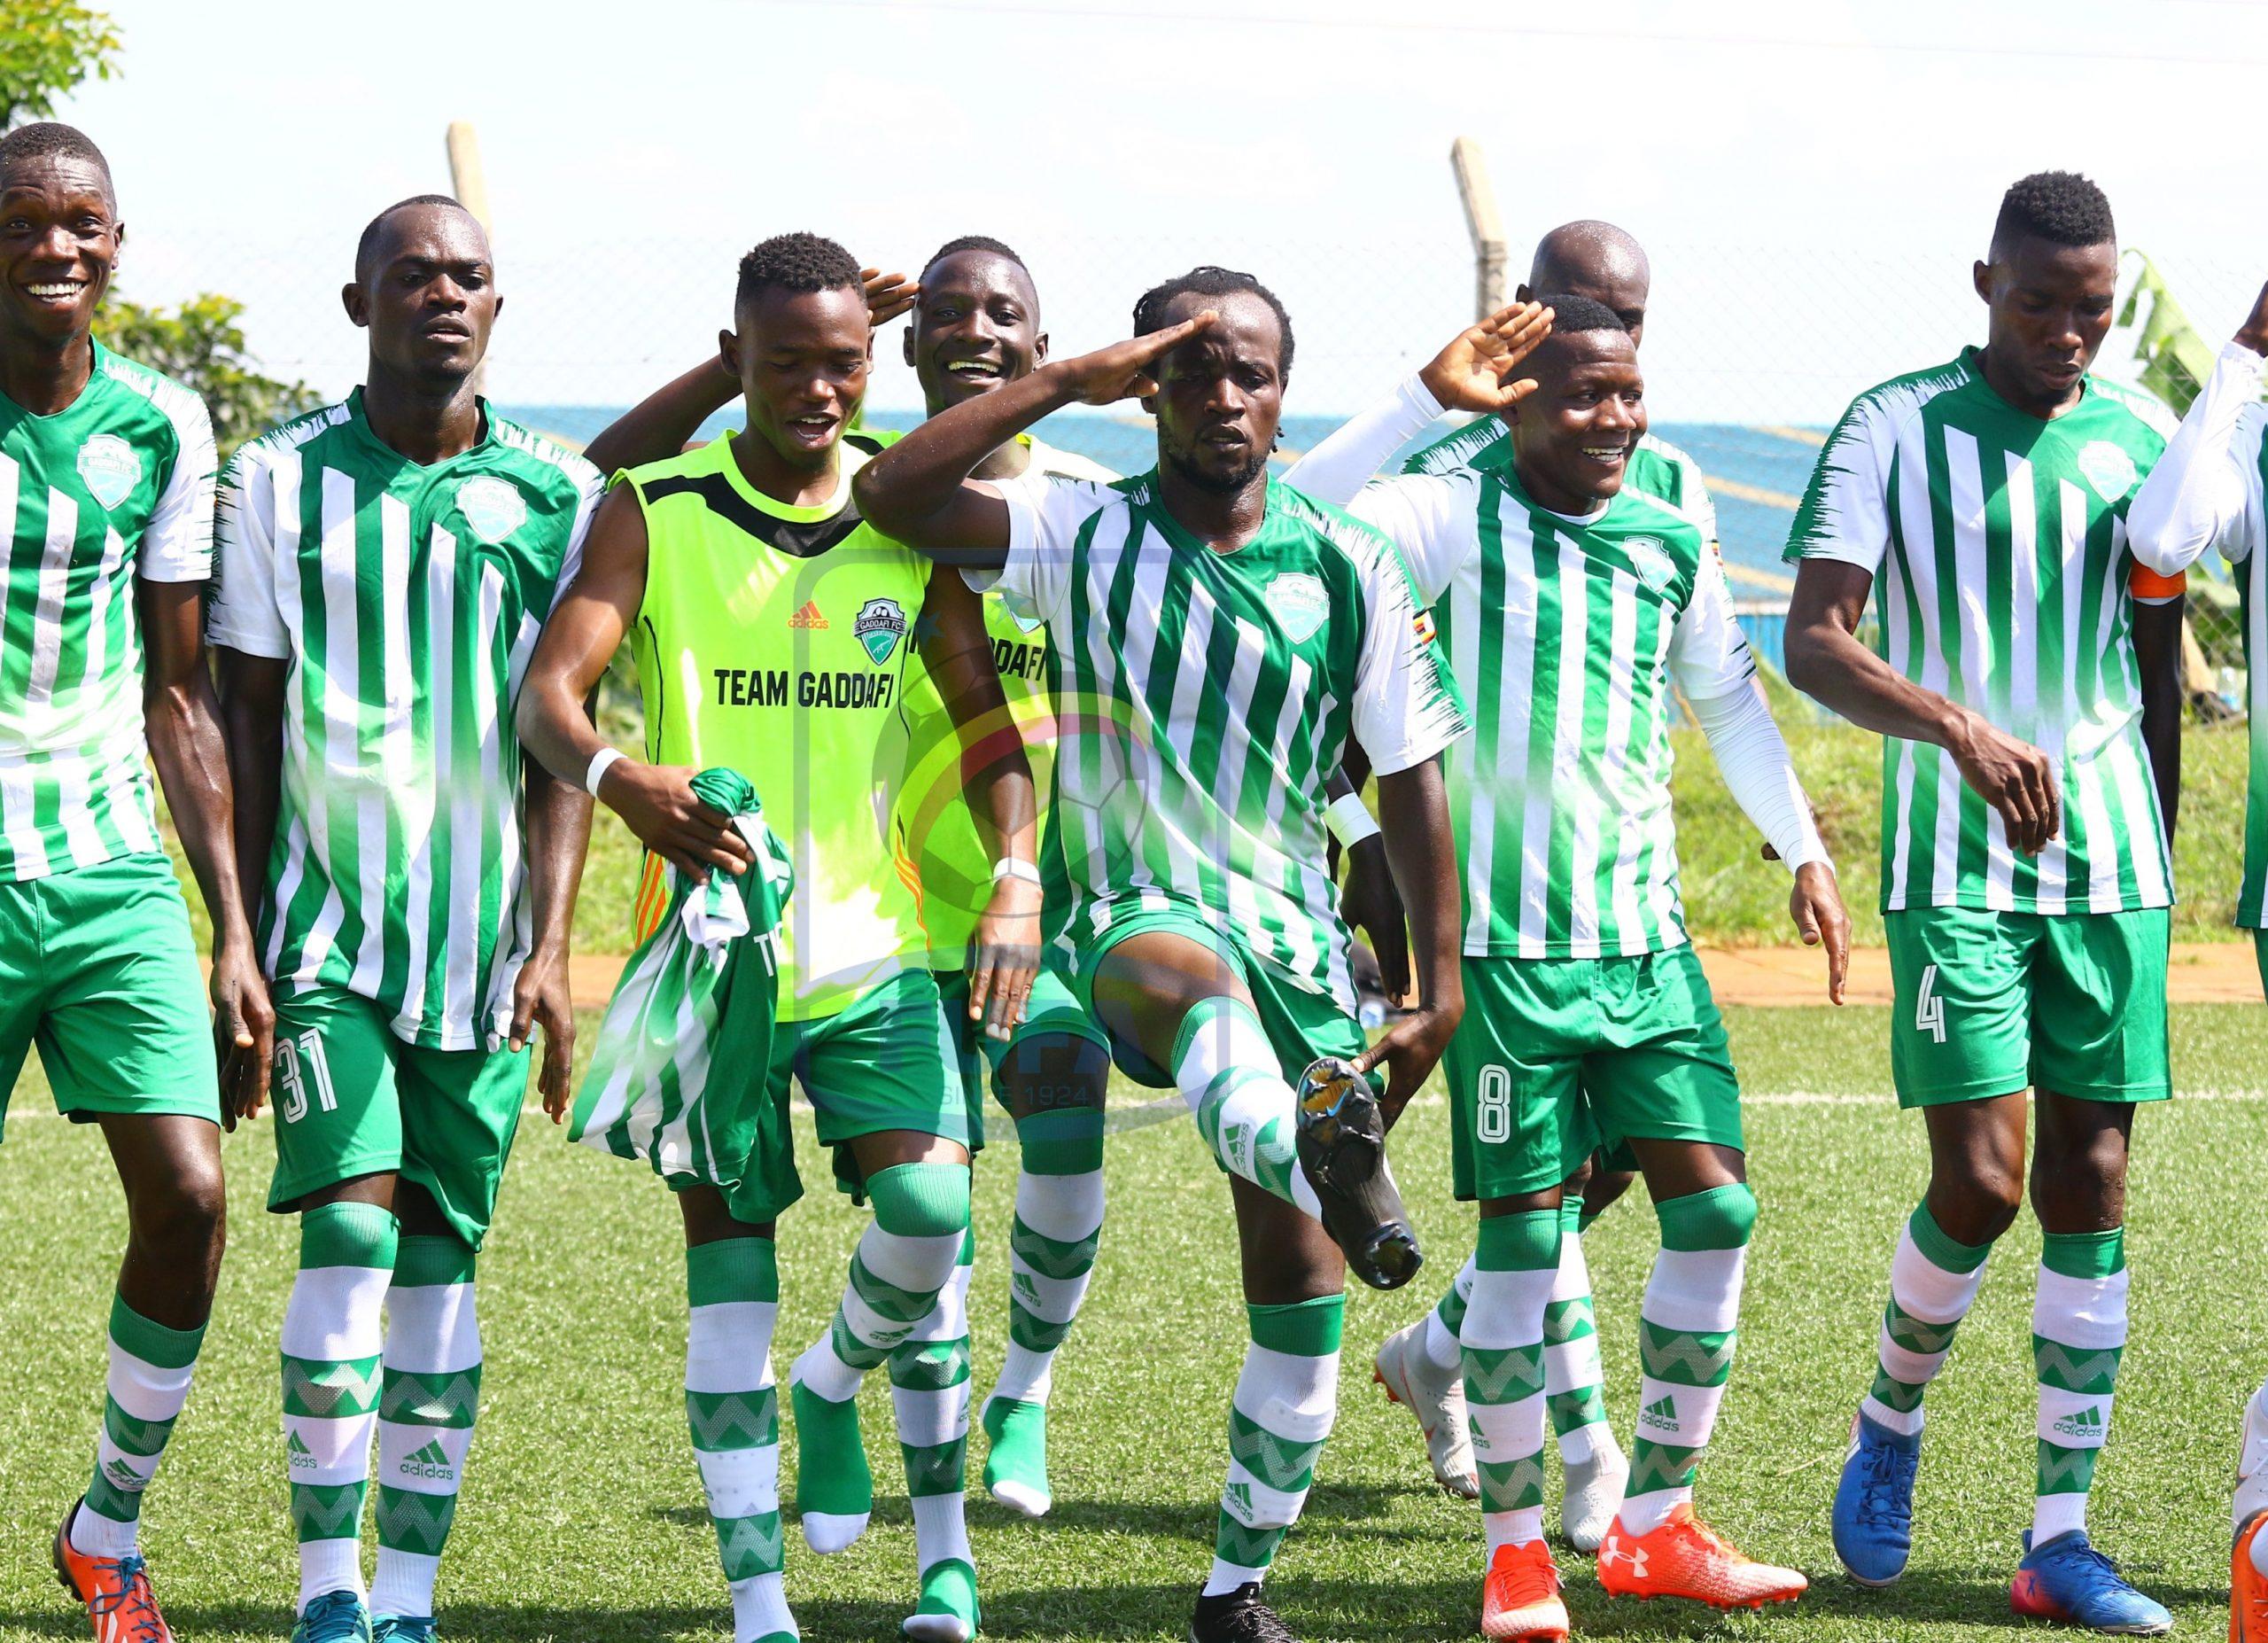 FUFA Eastern Regional Play-Offs: Edmond Robert nets in own net as Gaddafi humbles Admin FC 4:0